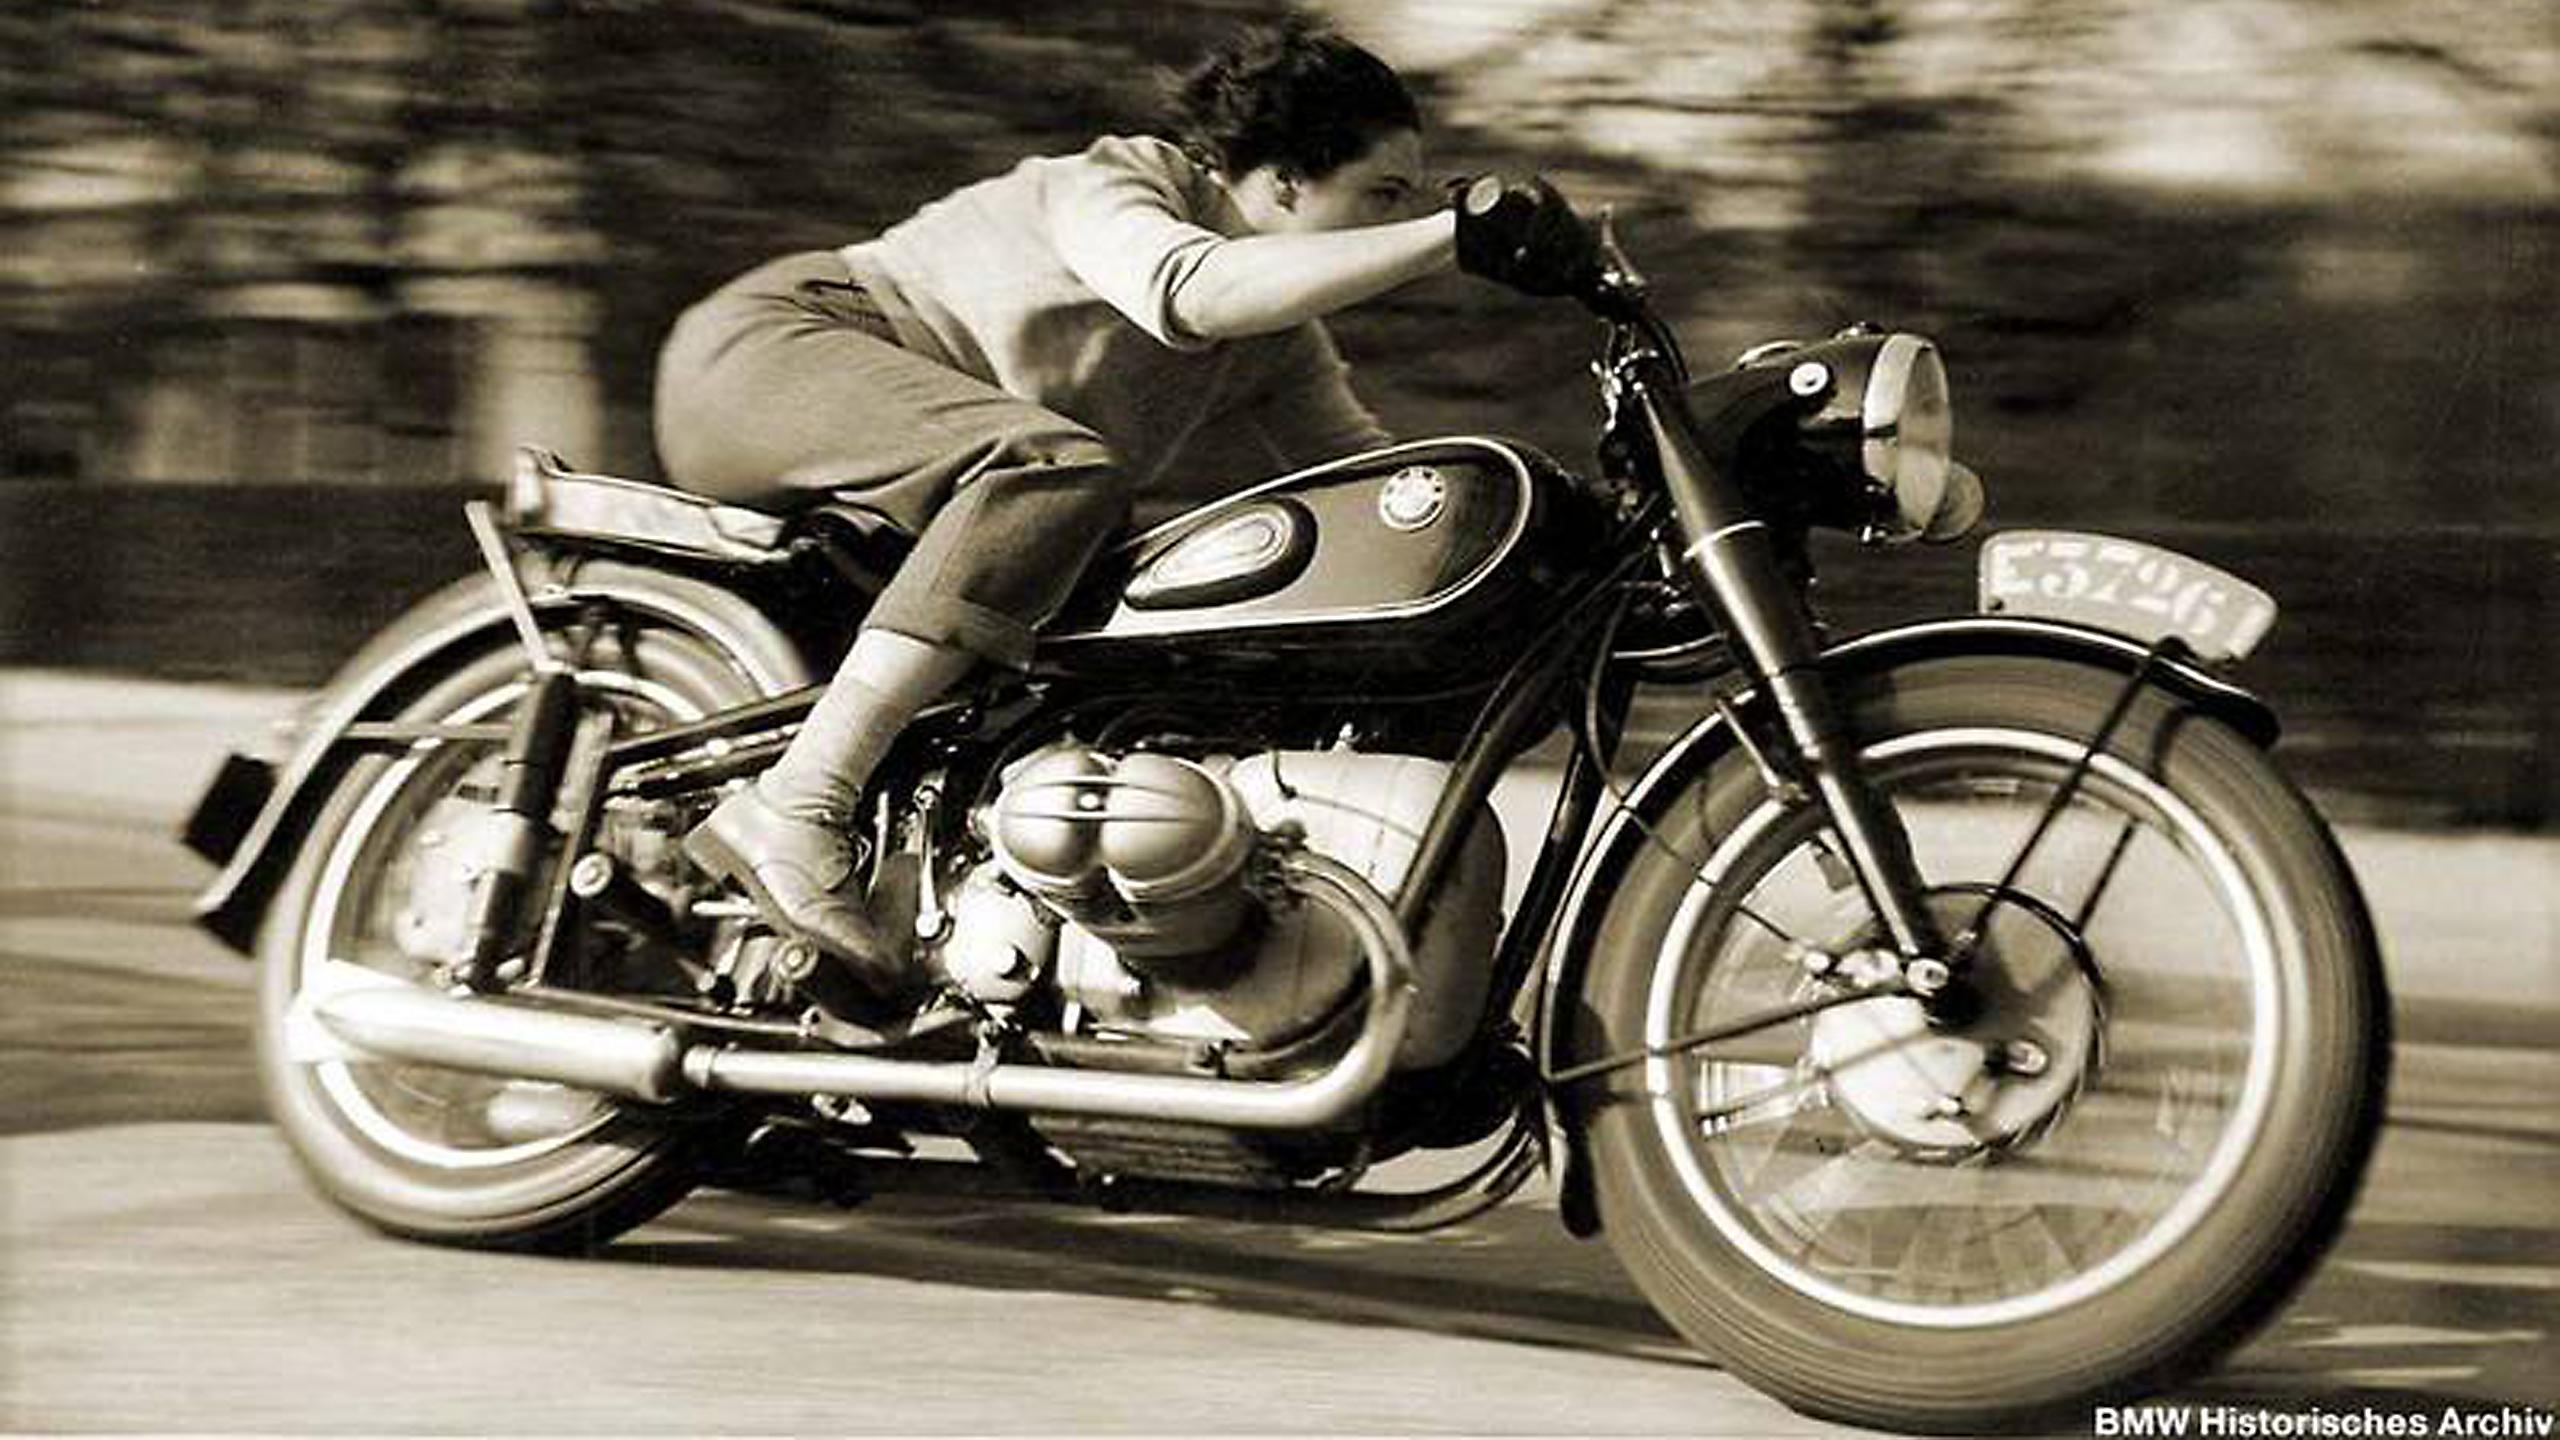 71] Vintage Motorcycle Wallpaper on WallpaperSafari 2560x1440